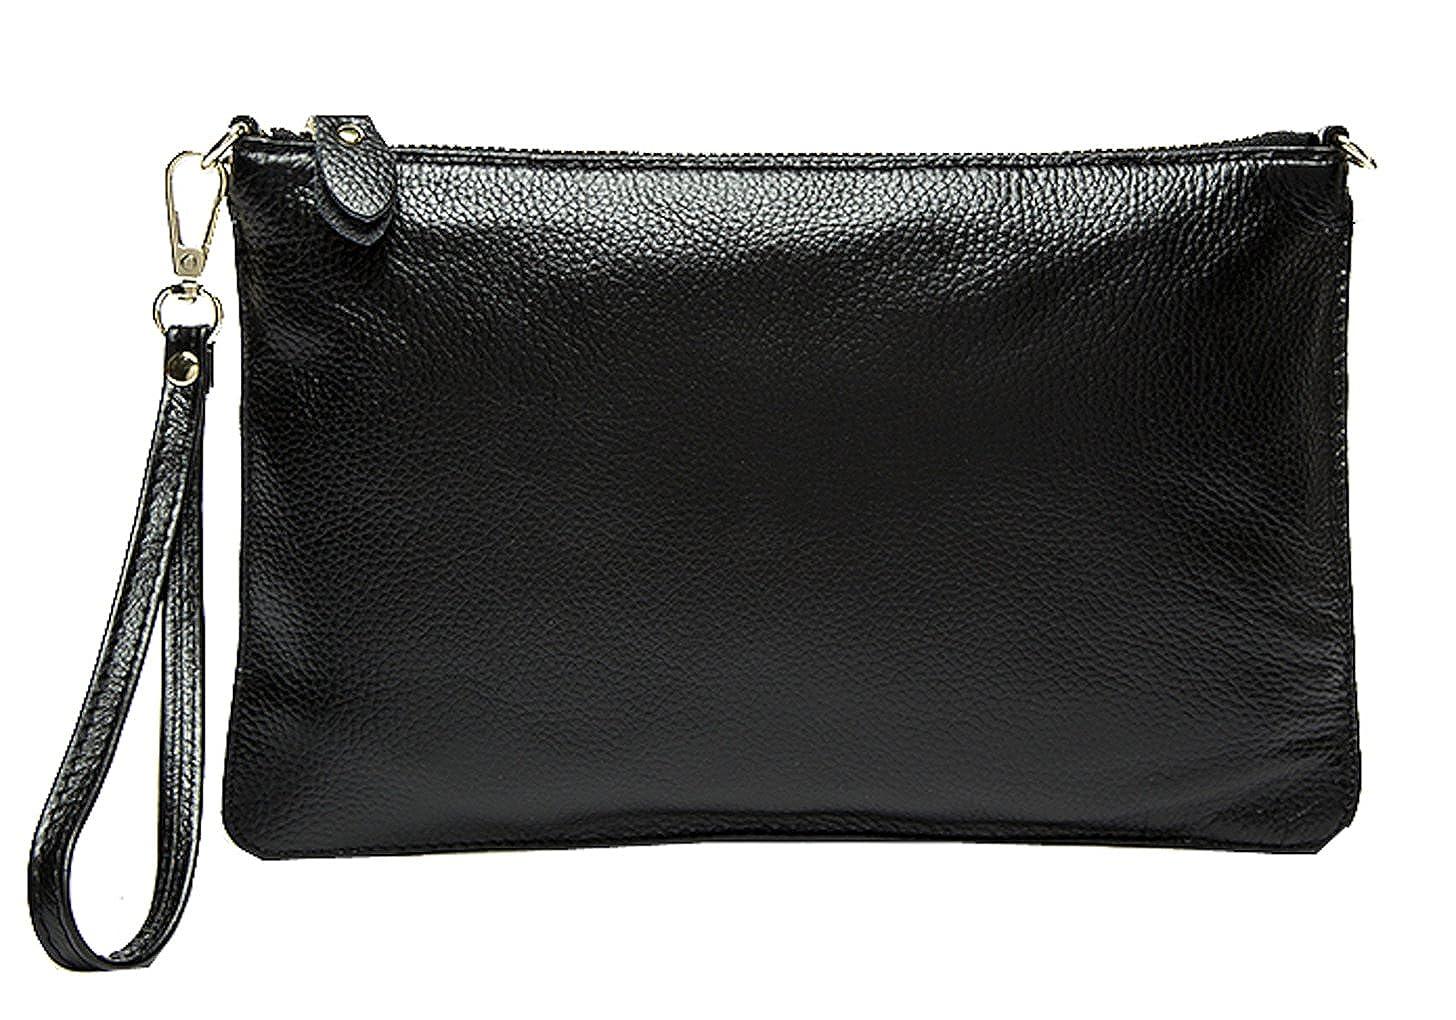 0dd431e0b6 SAIERLONG Ladies Designer Womens Black Genuine Leather Cross Body Bags  Shoulder Bags  Amazon.ca  Shoes   Handbags